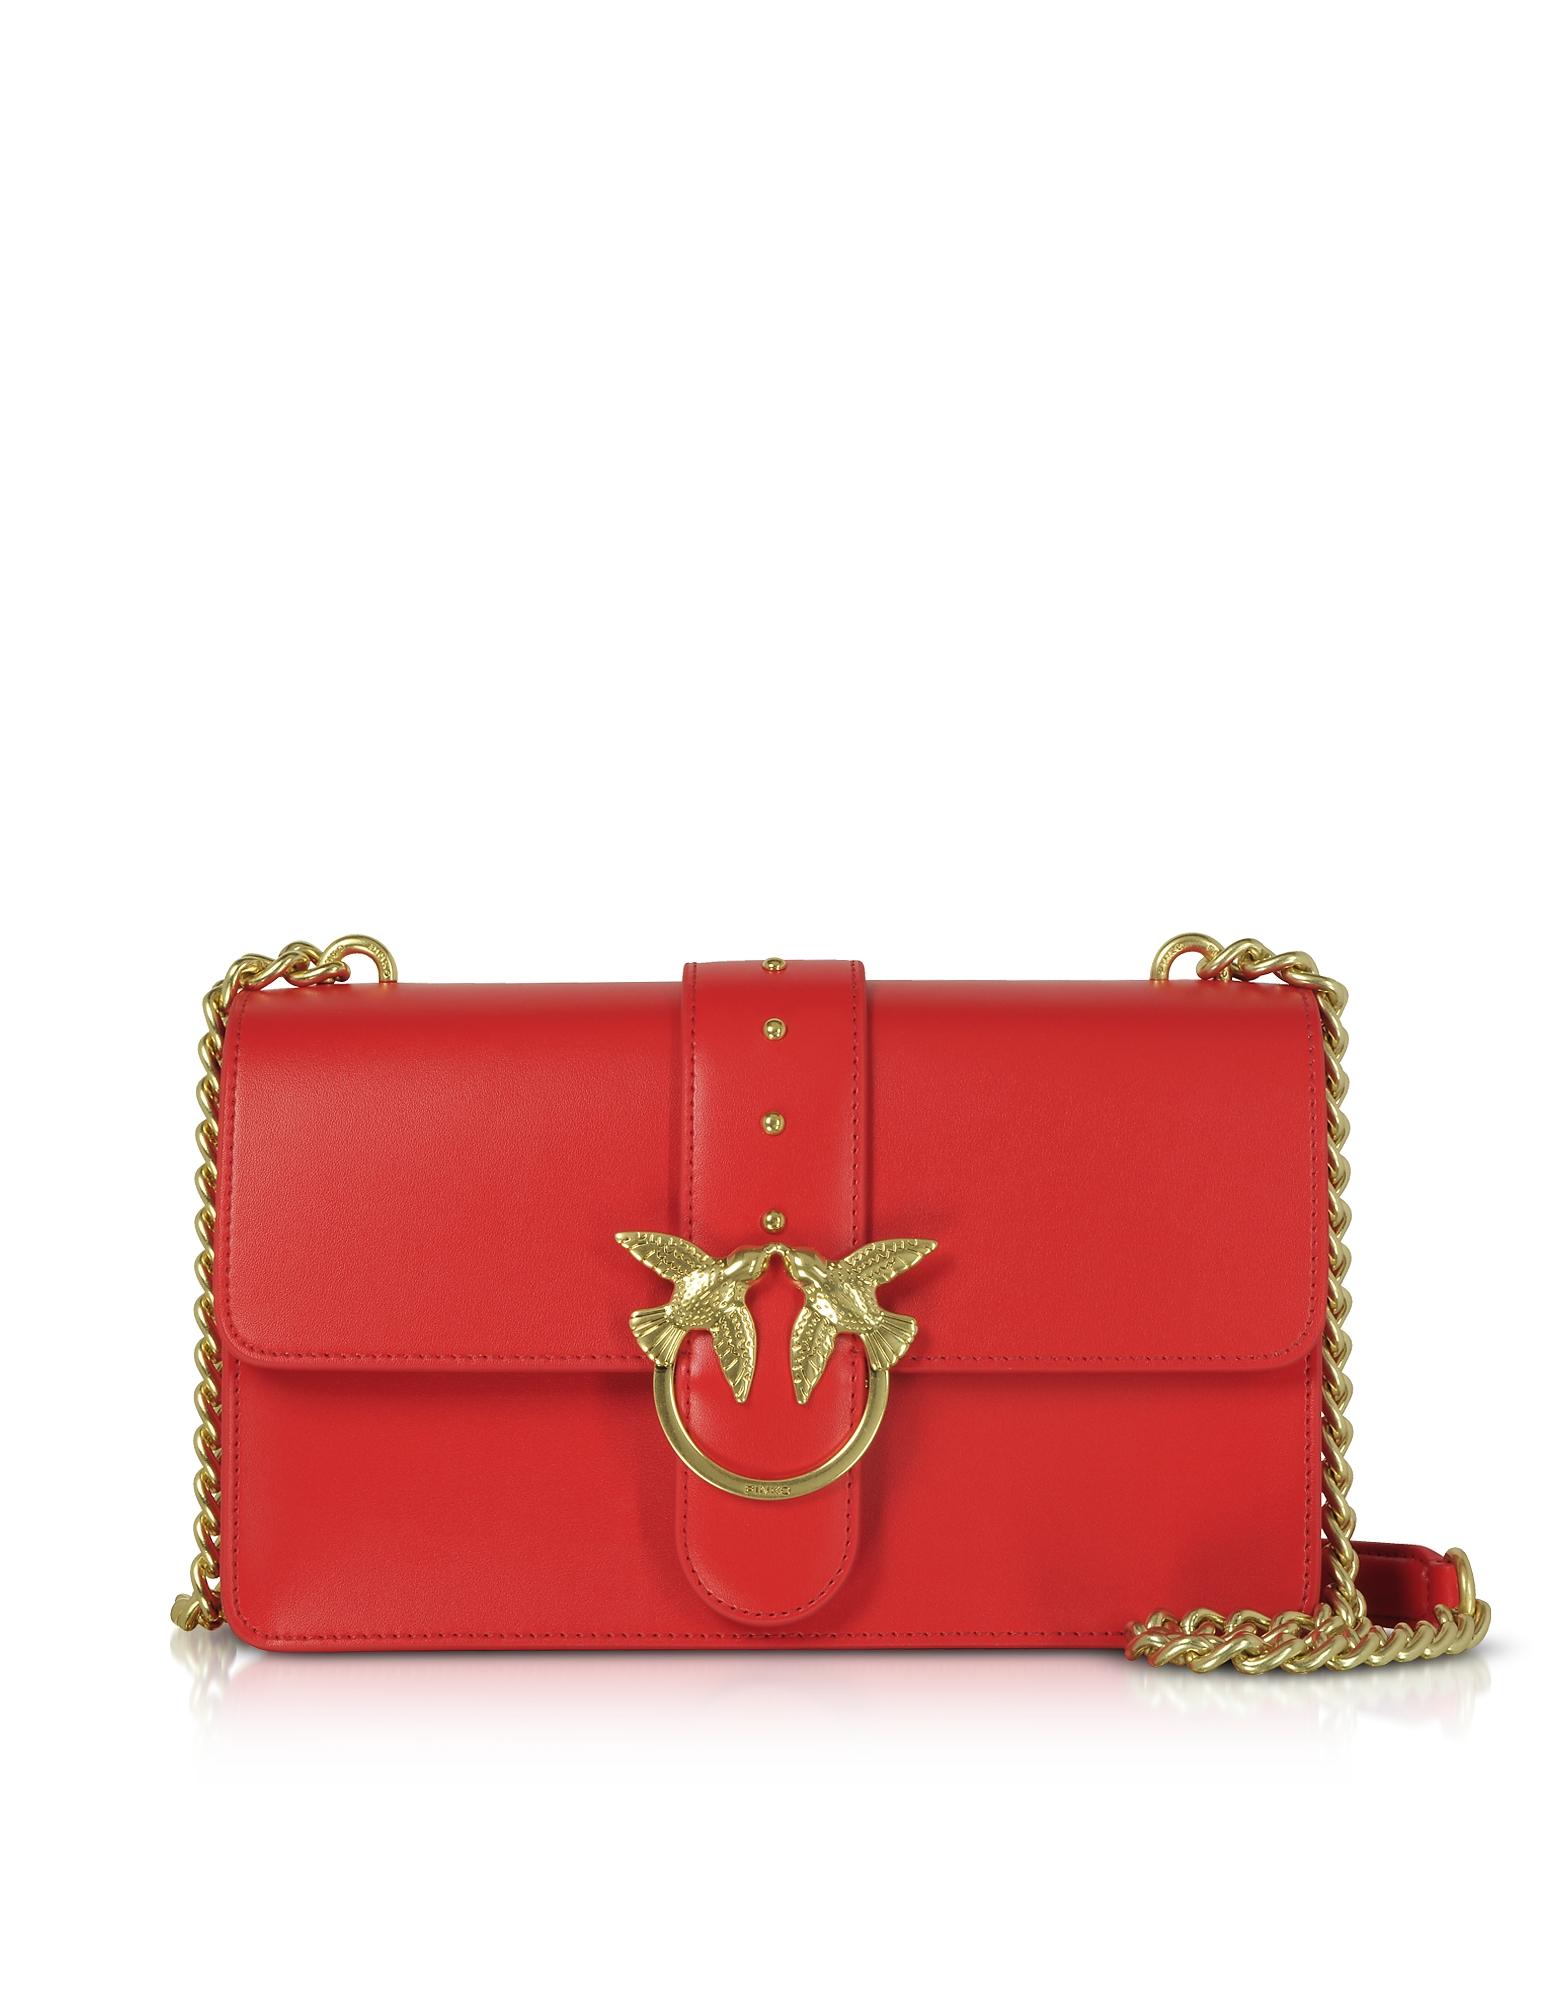 Leather Love Simply 10 Shoulder Bag